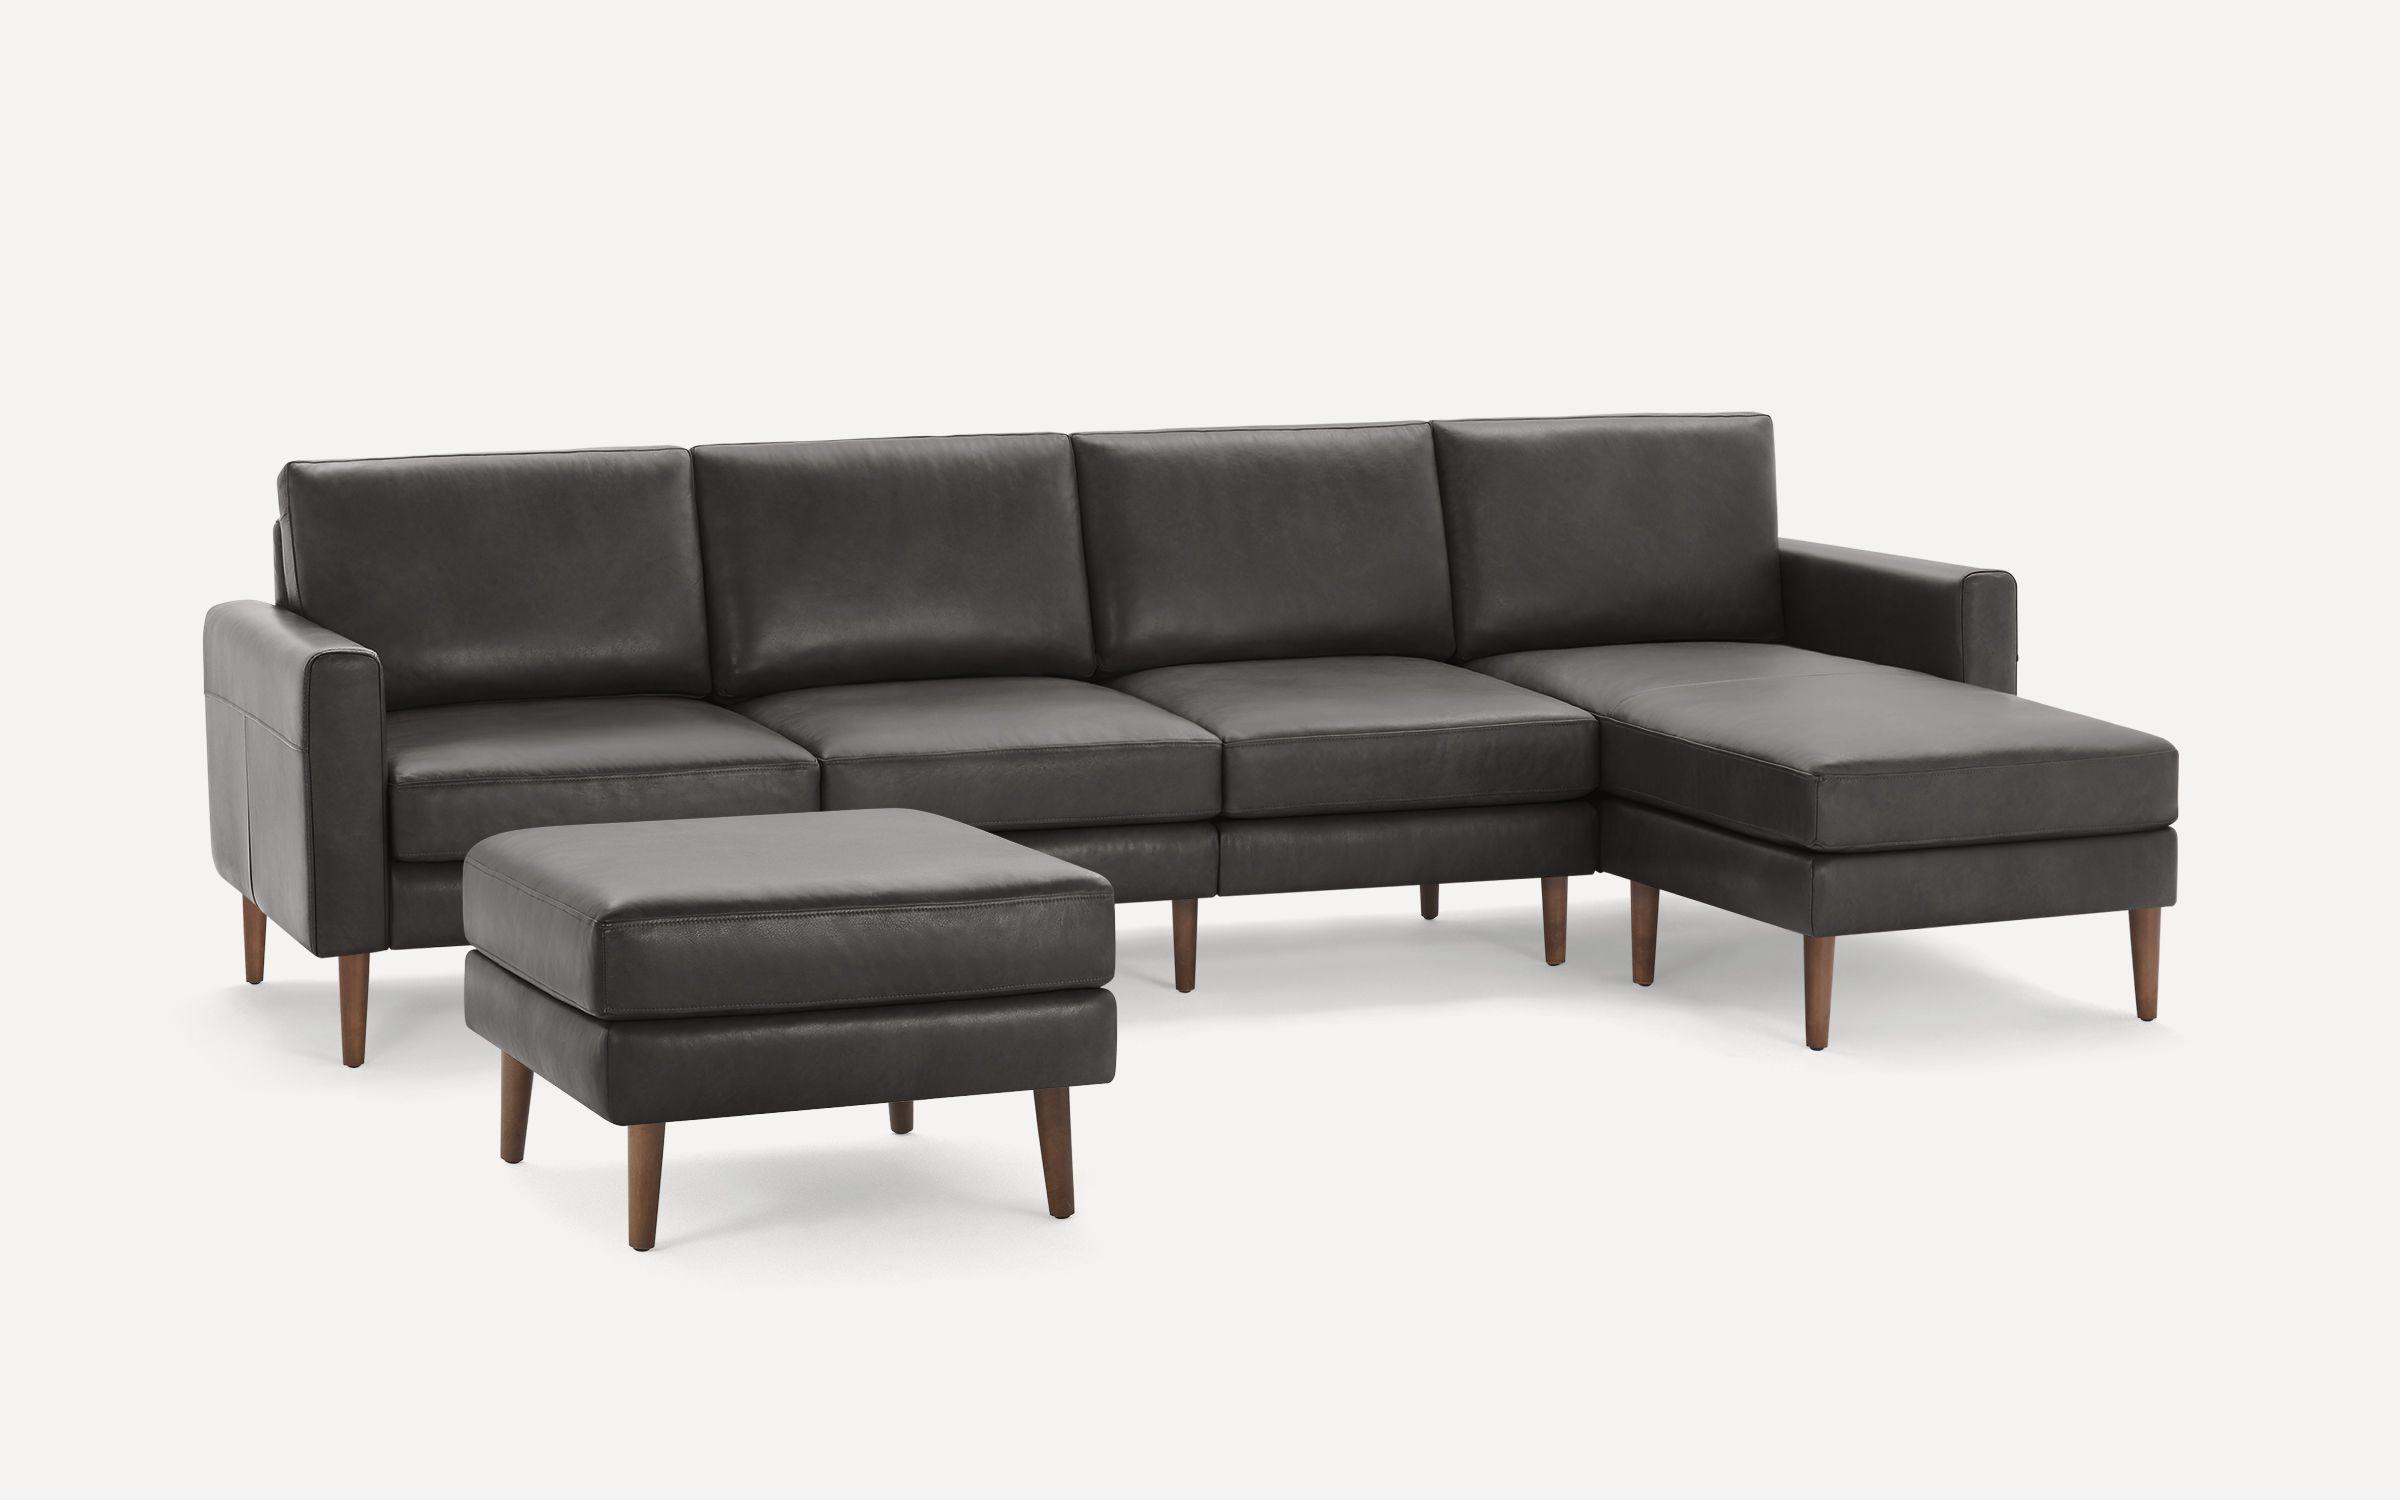 Sofa Honesty In 2020 Sofa Long Sofa Chaise